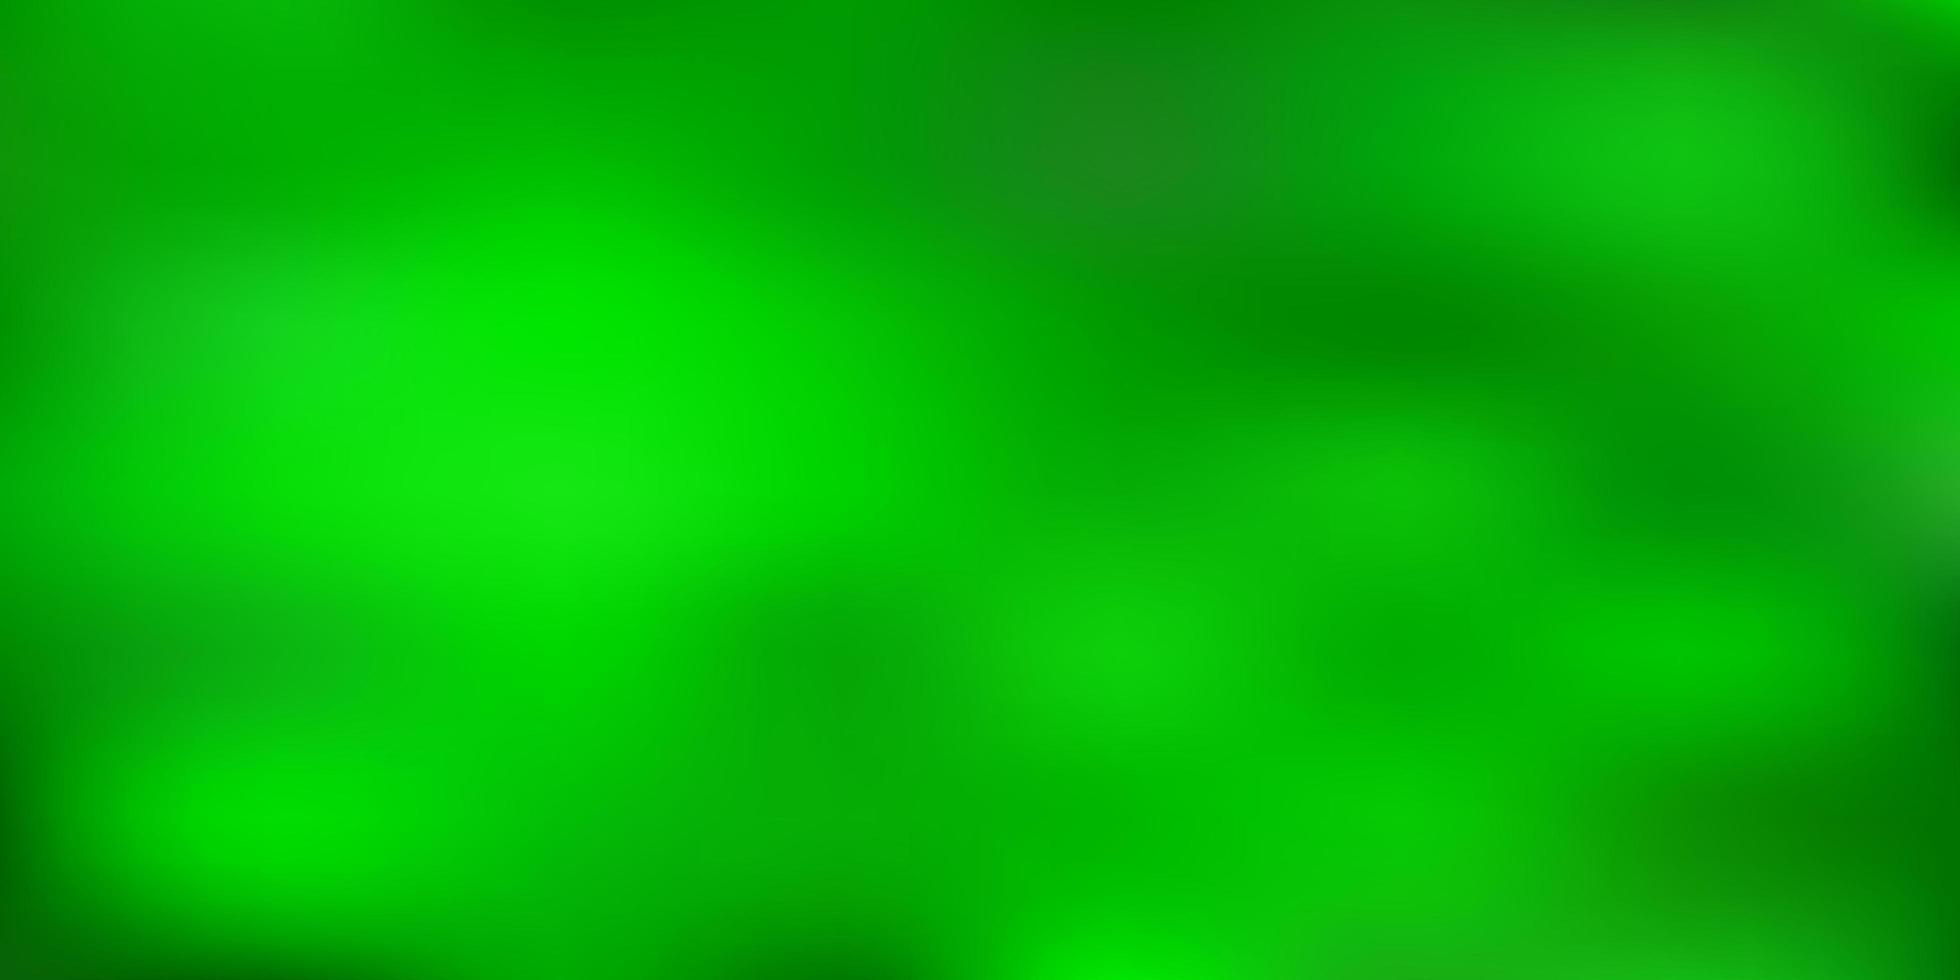 sfondo sfocato sfumato vettoriale verde chiaro.